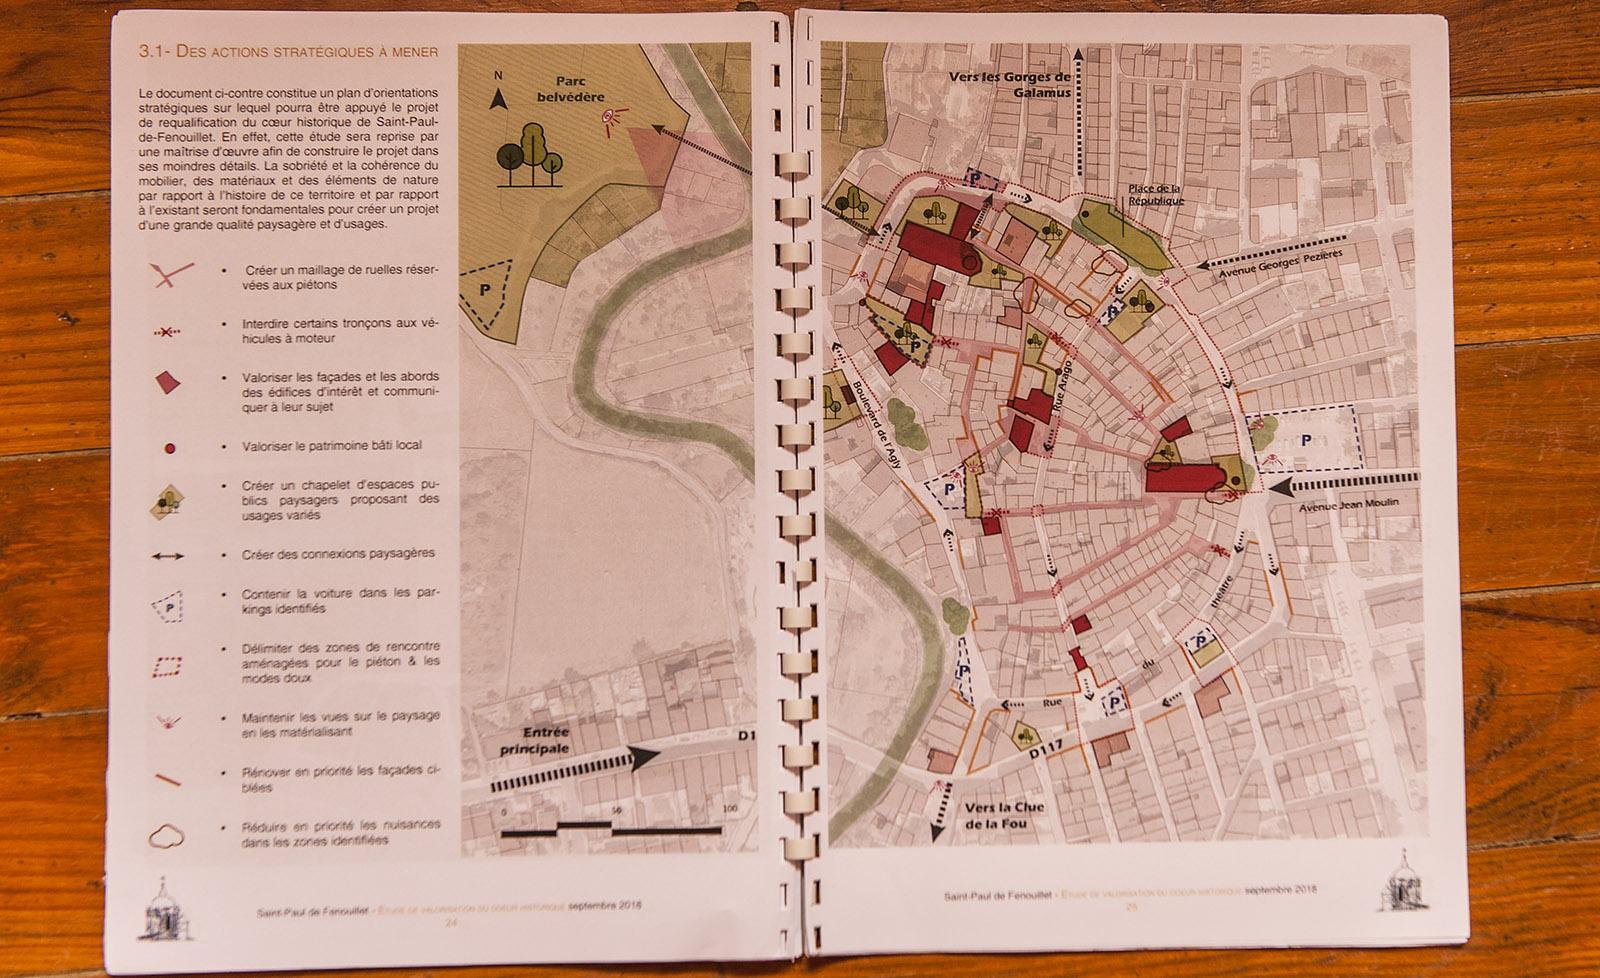 Saint-Paul-de-Fenouillet: Stadtplanung. Foto: Hilke Maunder